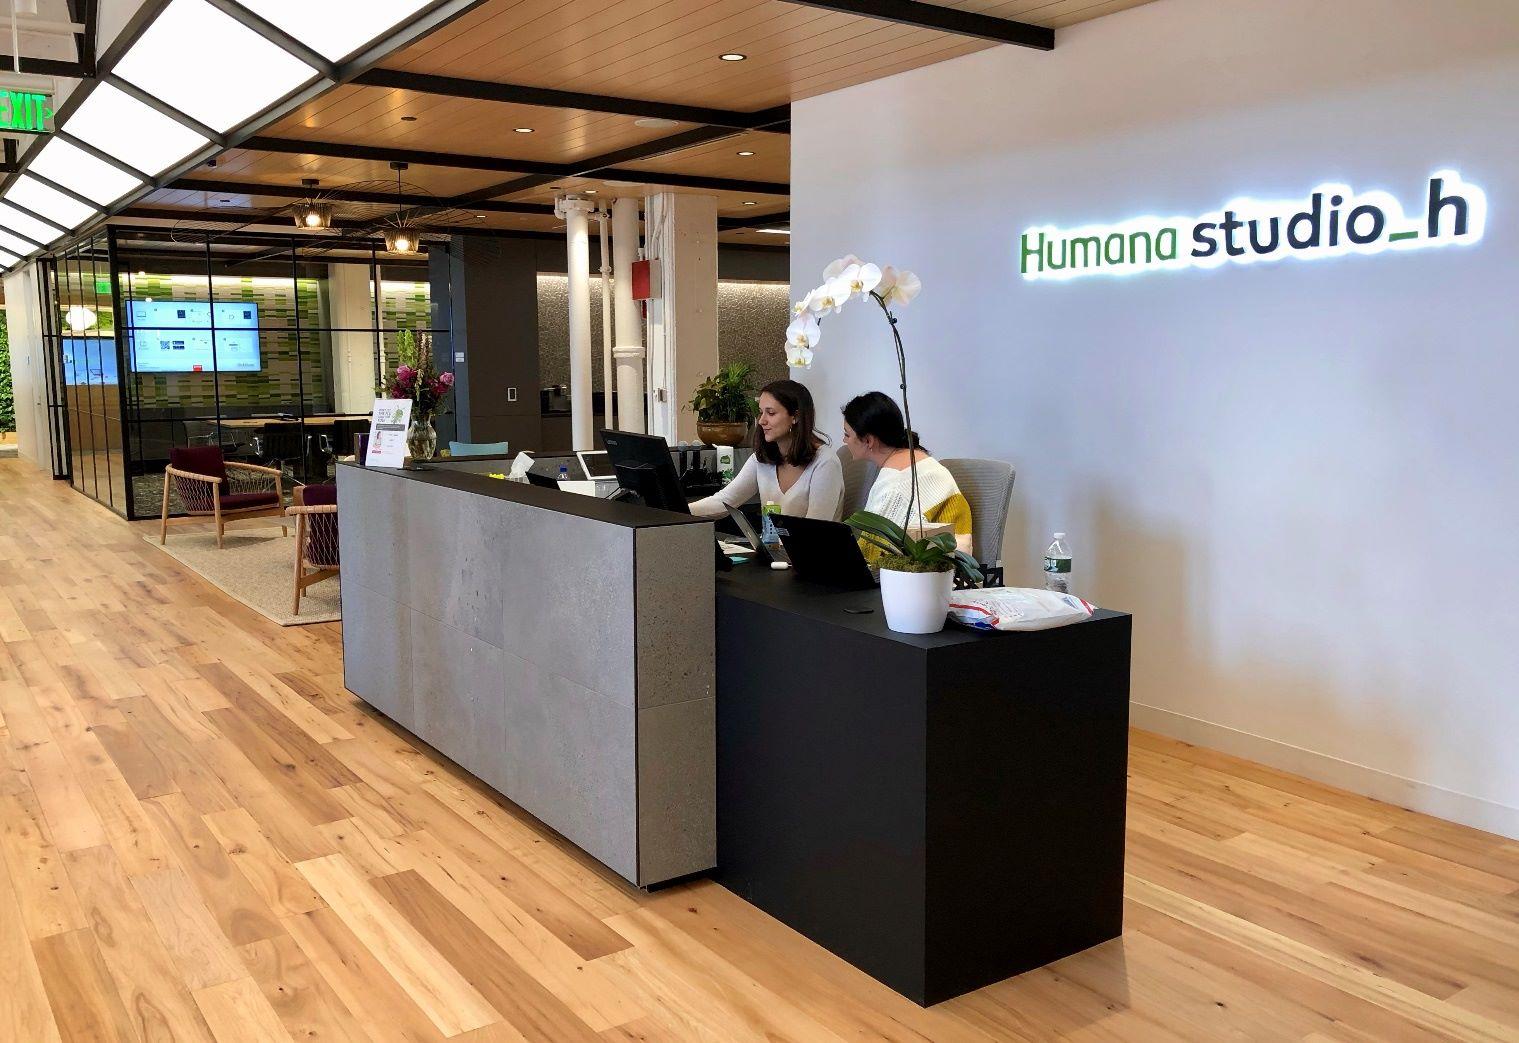 a frontdesk at Humana studio h